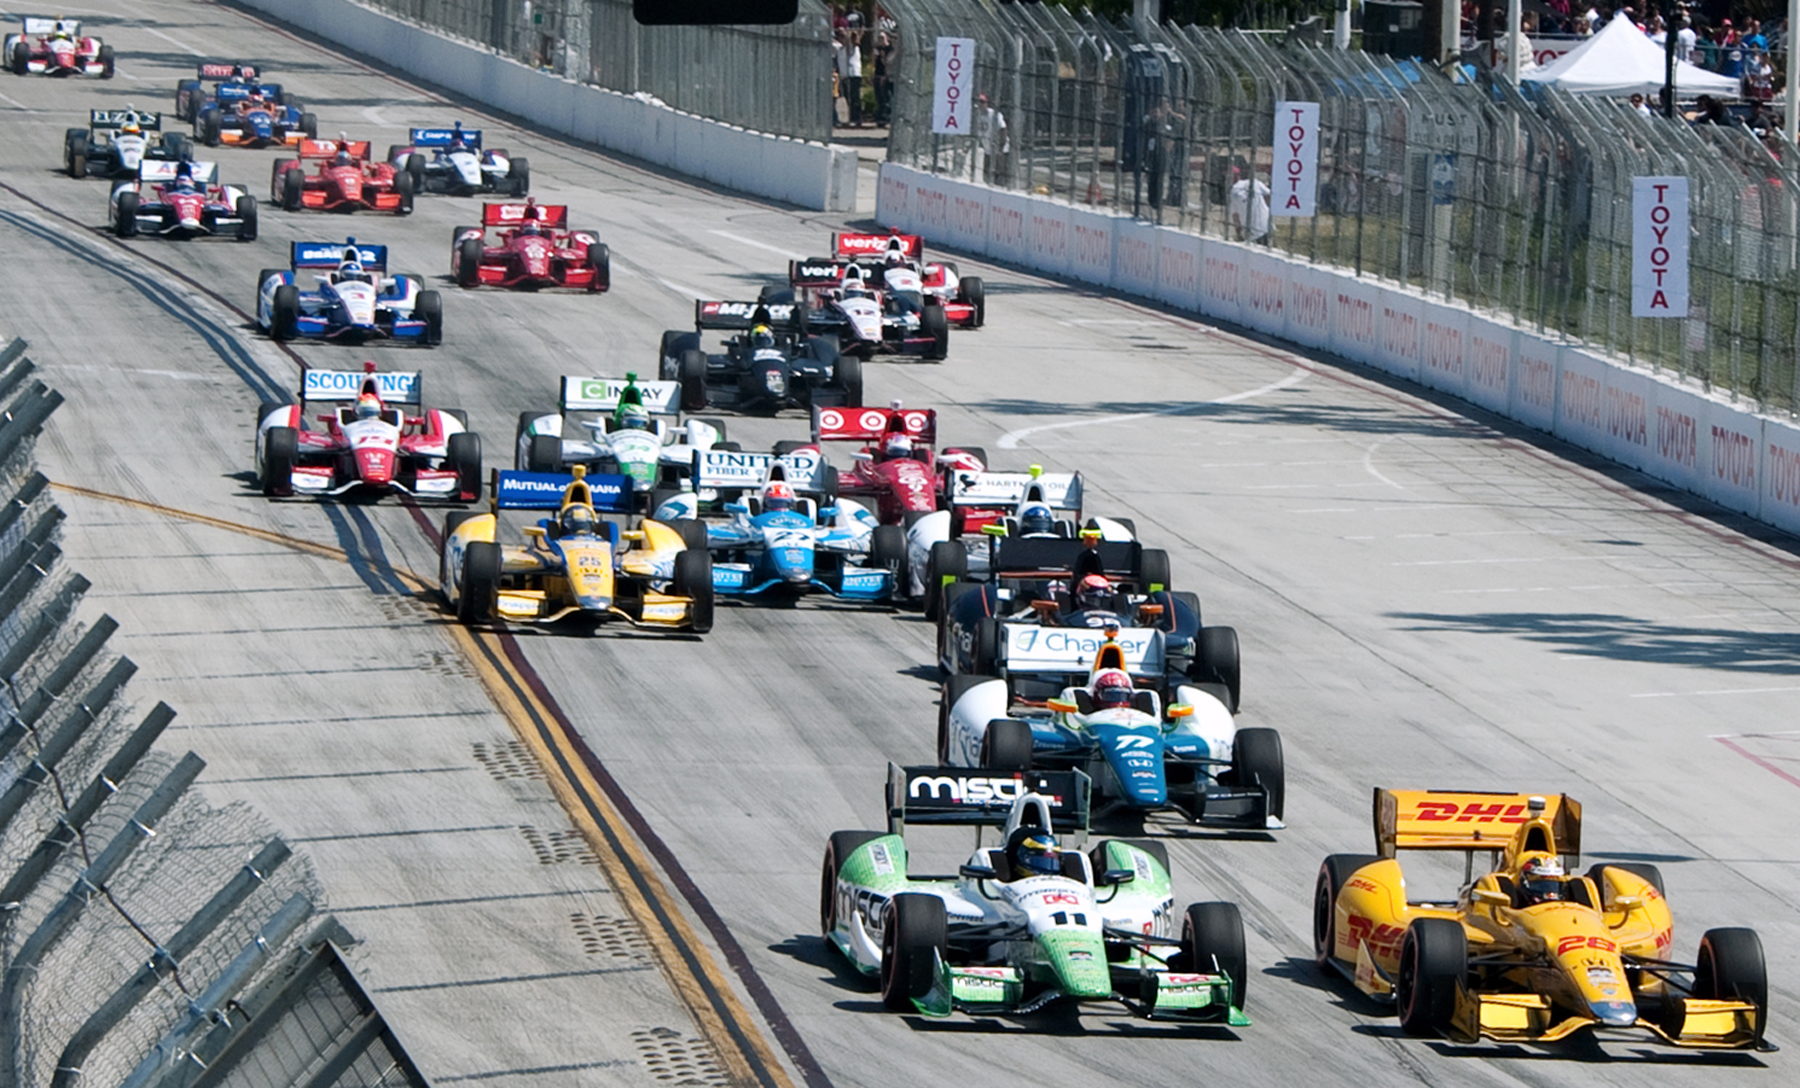 CAPTION-4-Start-of-the-IndyCar-race.jpg